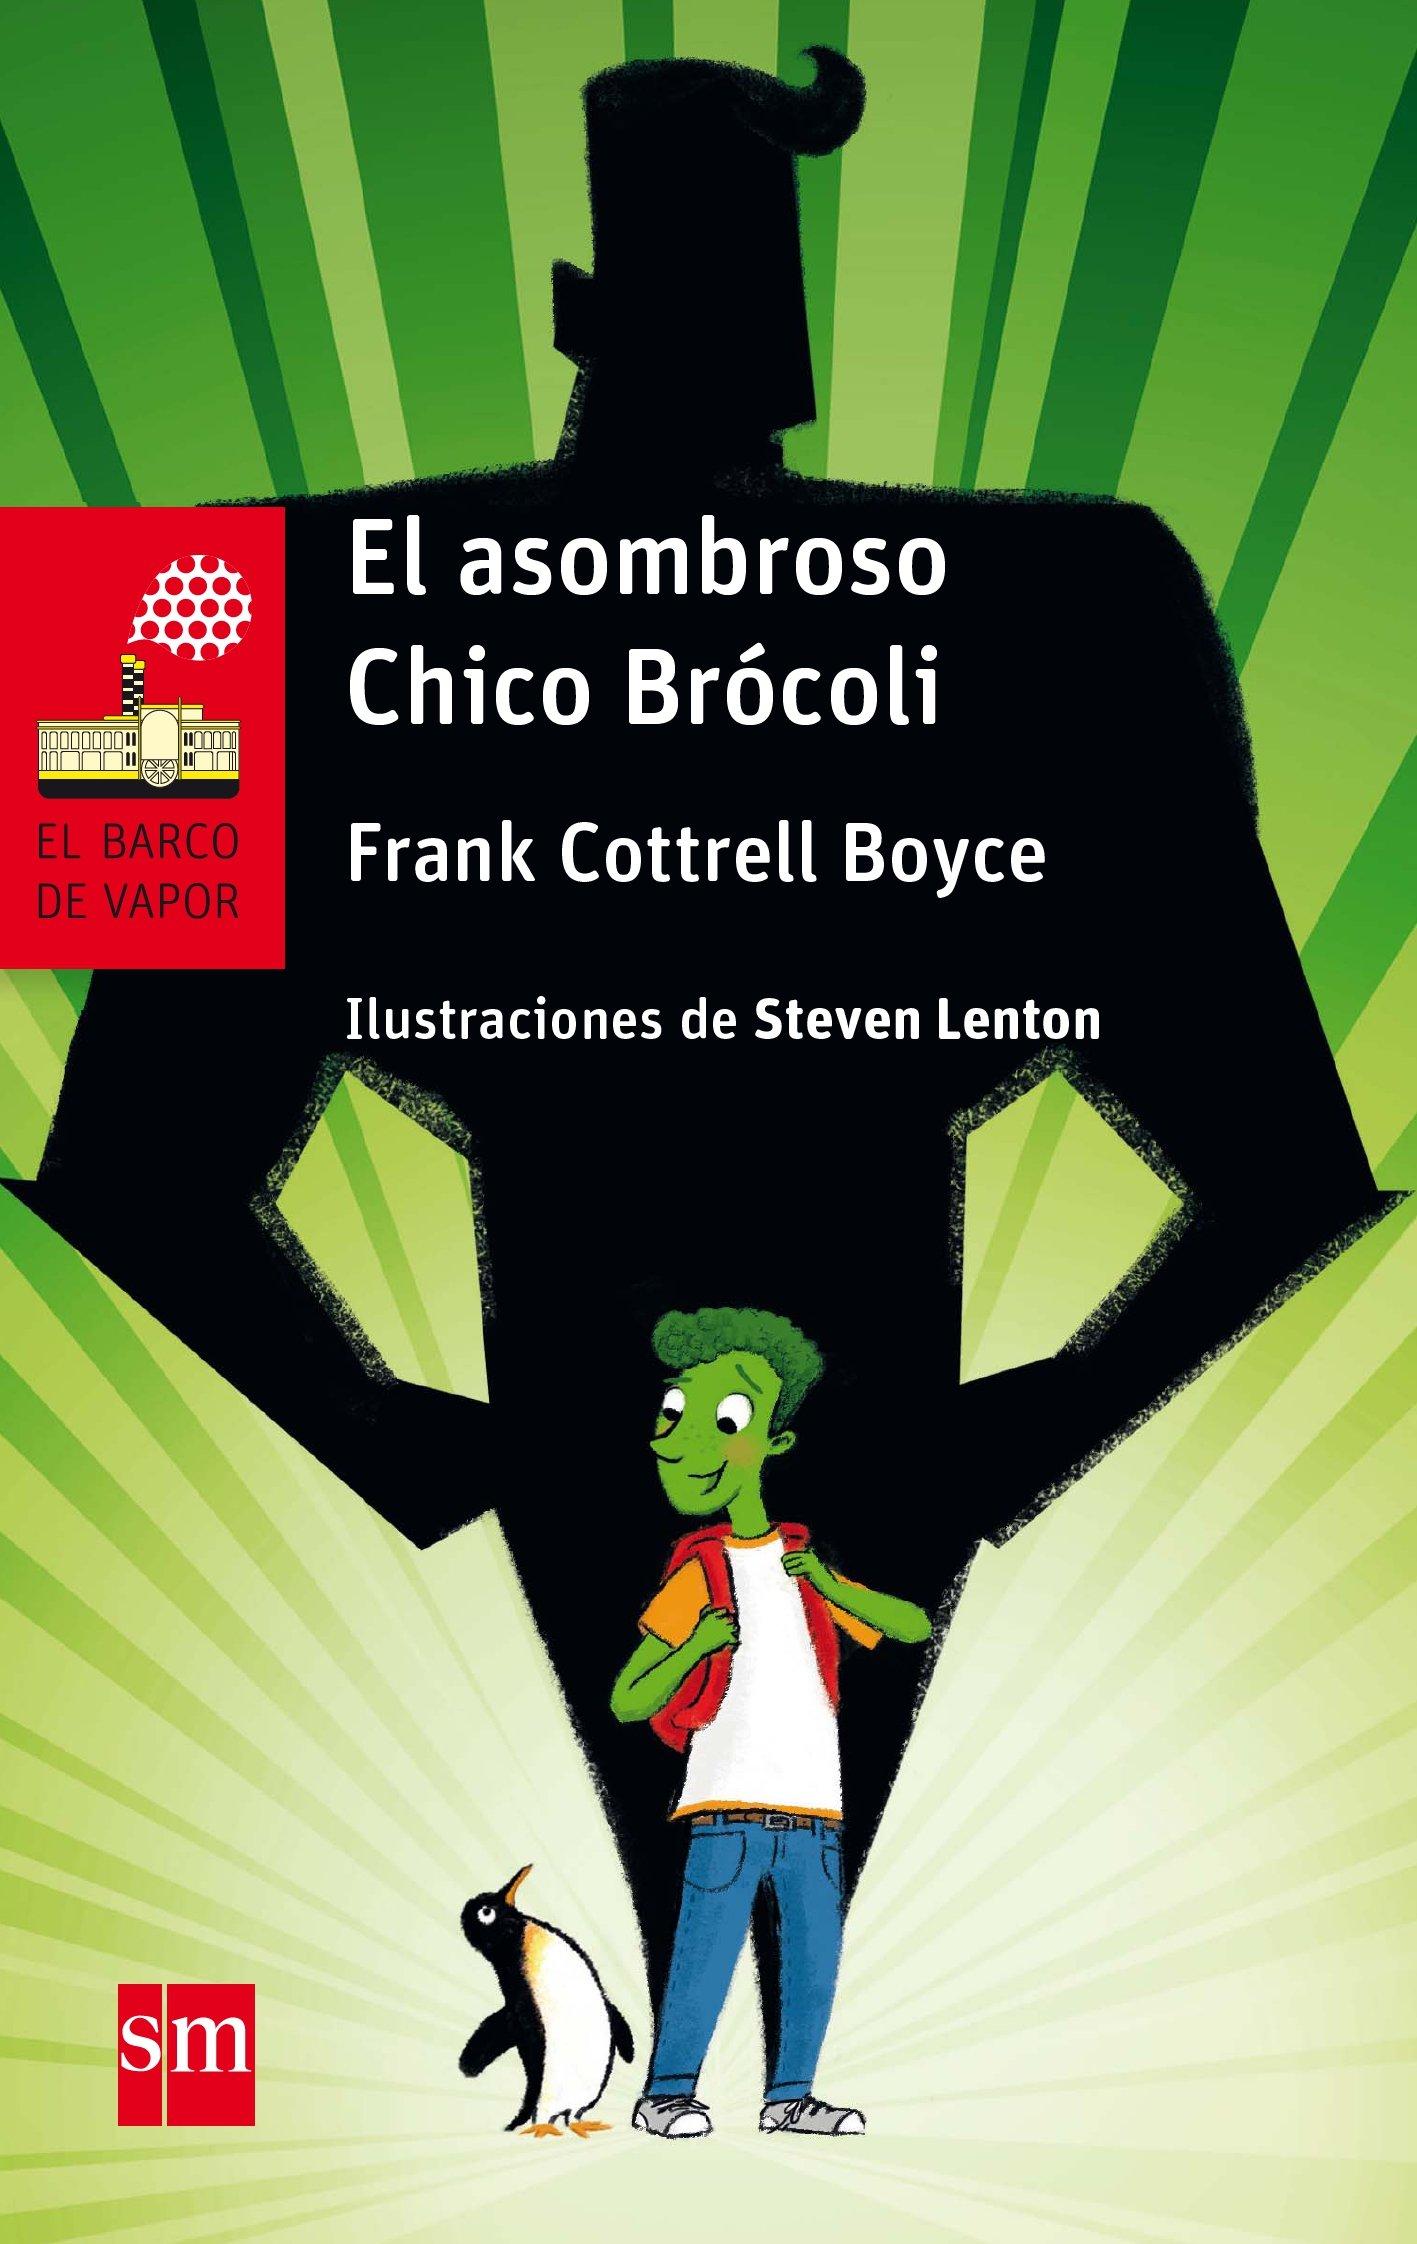 El asombroso Chico Brócoli (El Barco de Vapor Roja): Amazon.es: Frank  Cottrell Boyce, Steve Lenton, Xohana Bastida Calvo: Libros